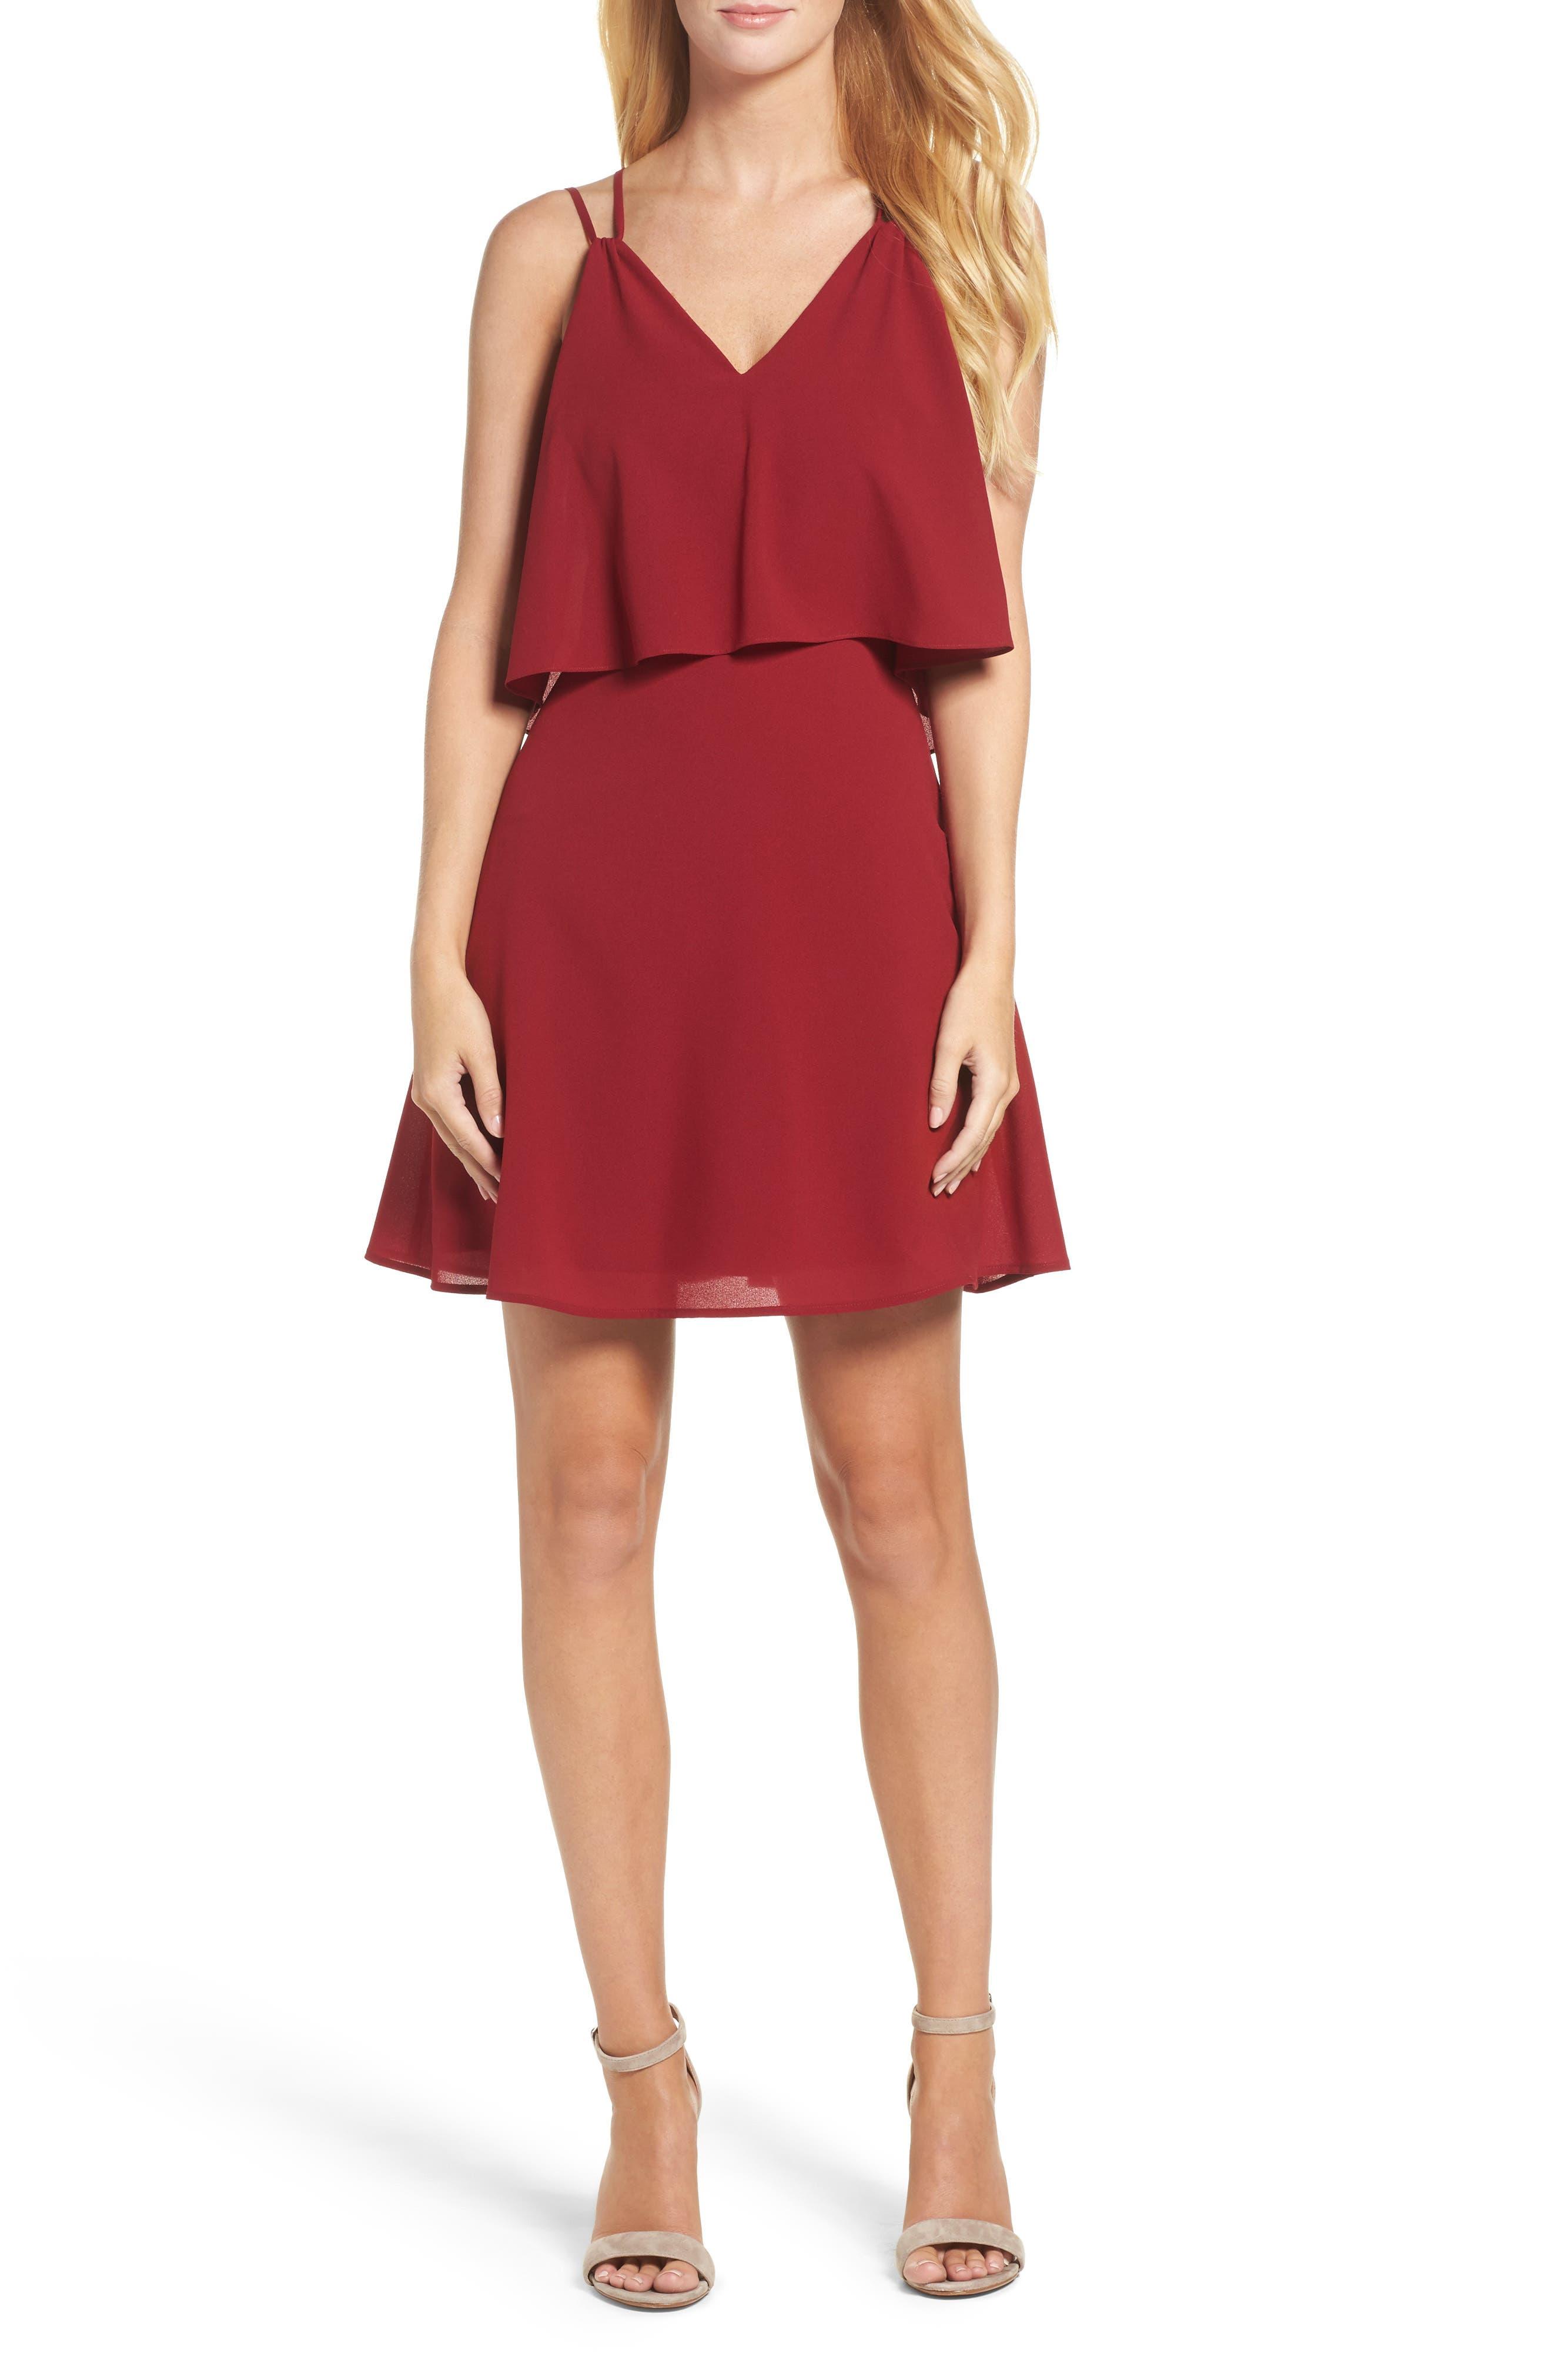 Free Spirit Popover Minidress,                         Main,                         color, 639